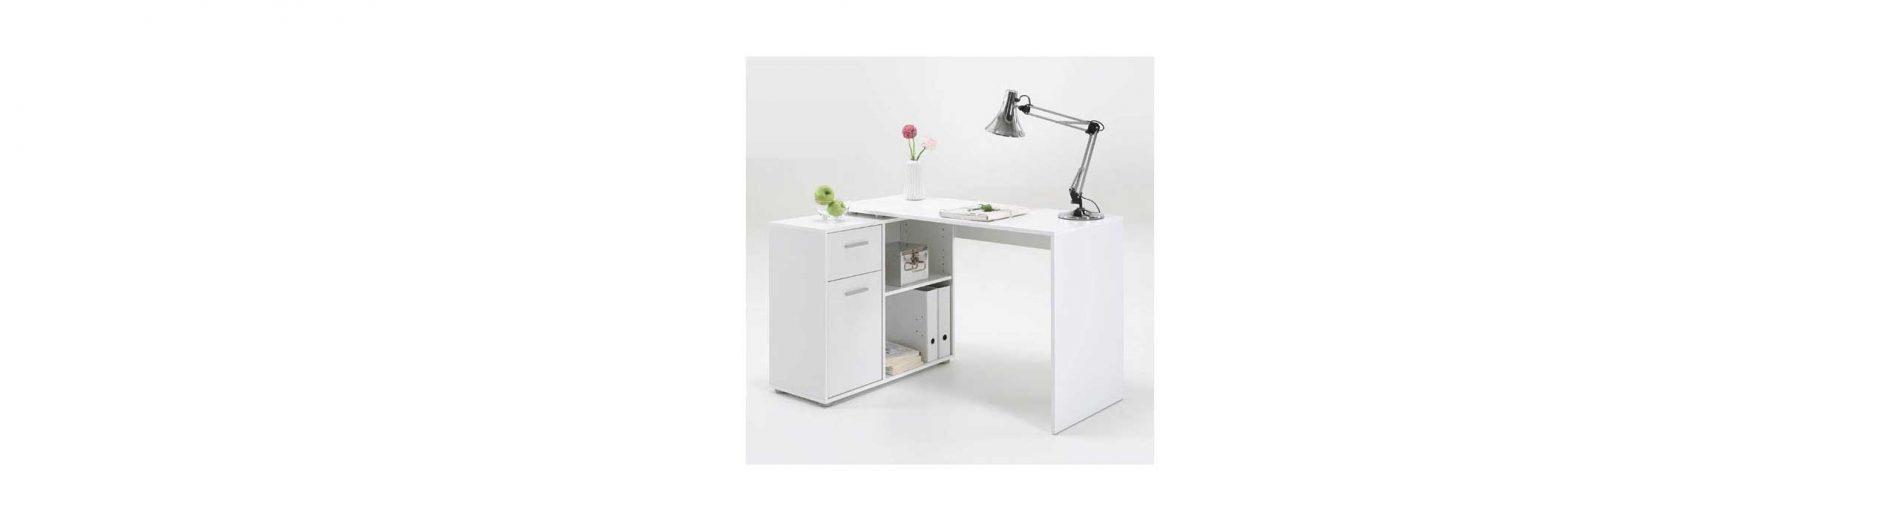 7 Corner Computer Desks For Bedroom Ideas That Work In Any Room